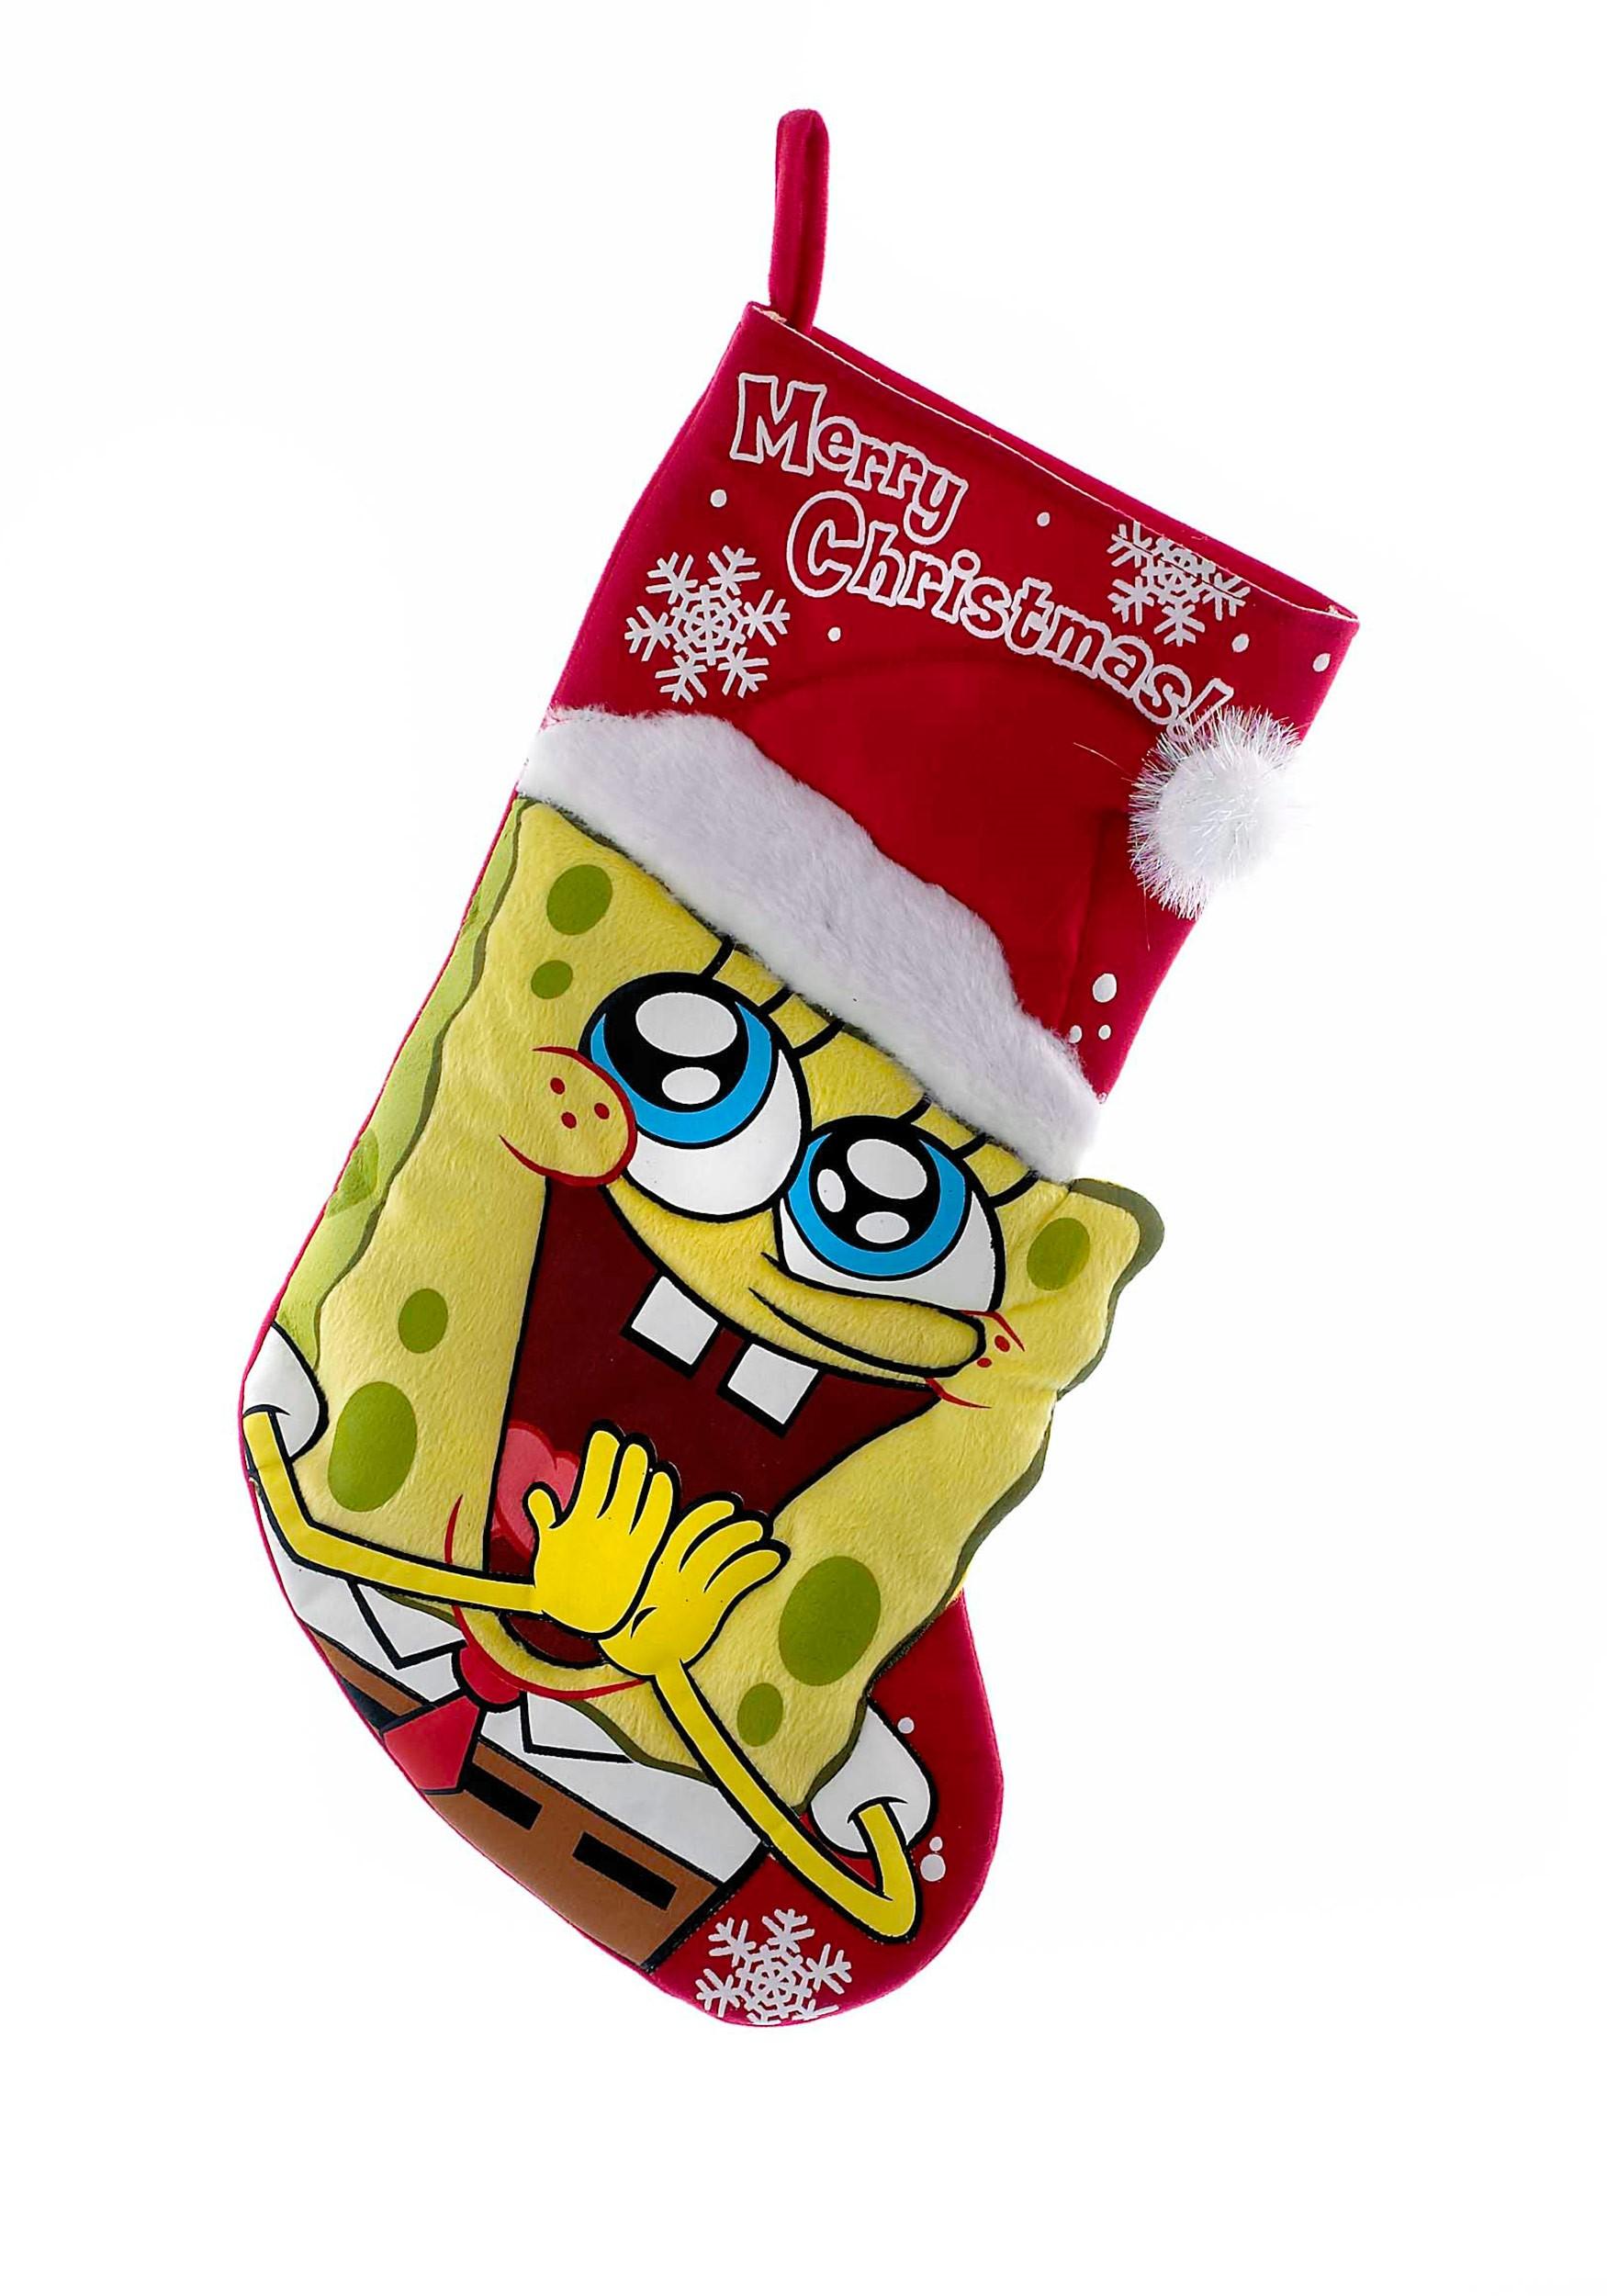 Spongebob Squarepants Printed Applique Stocking